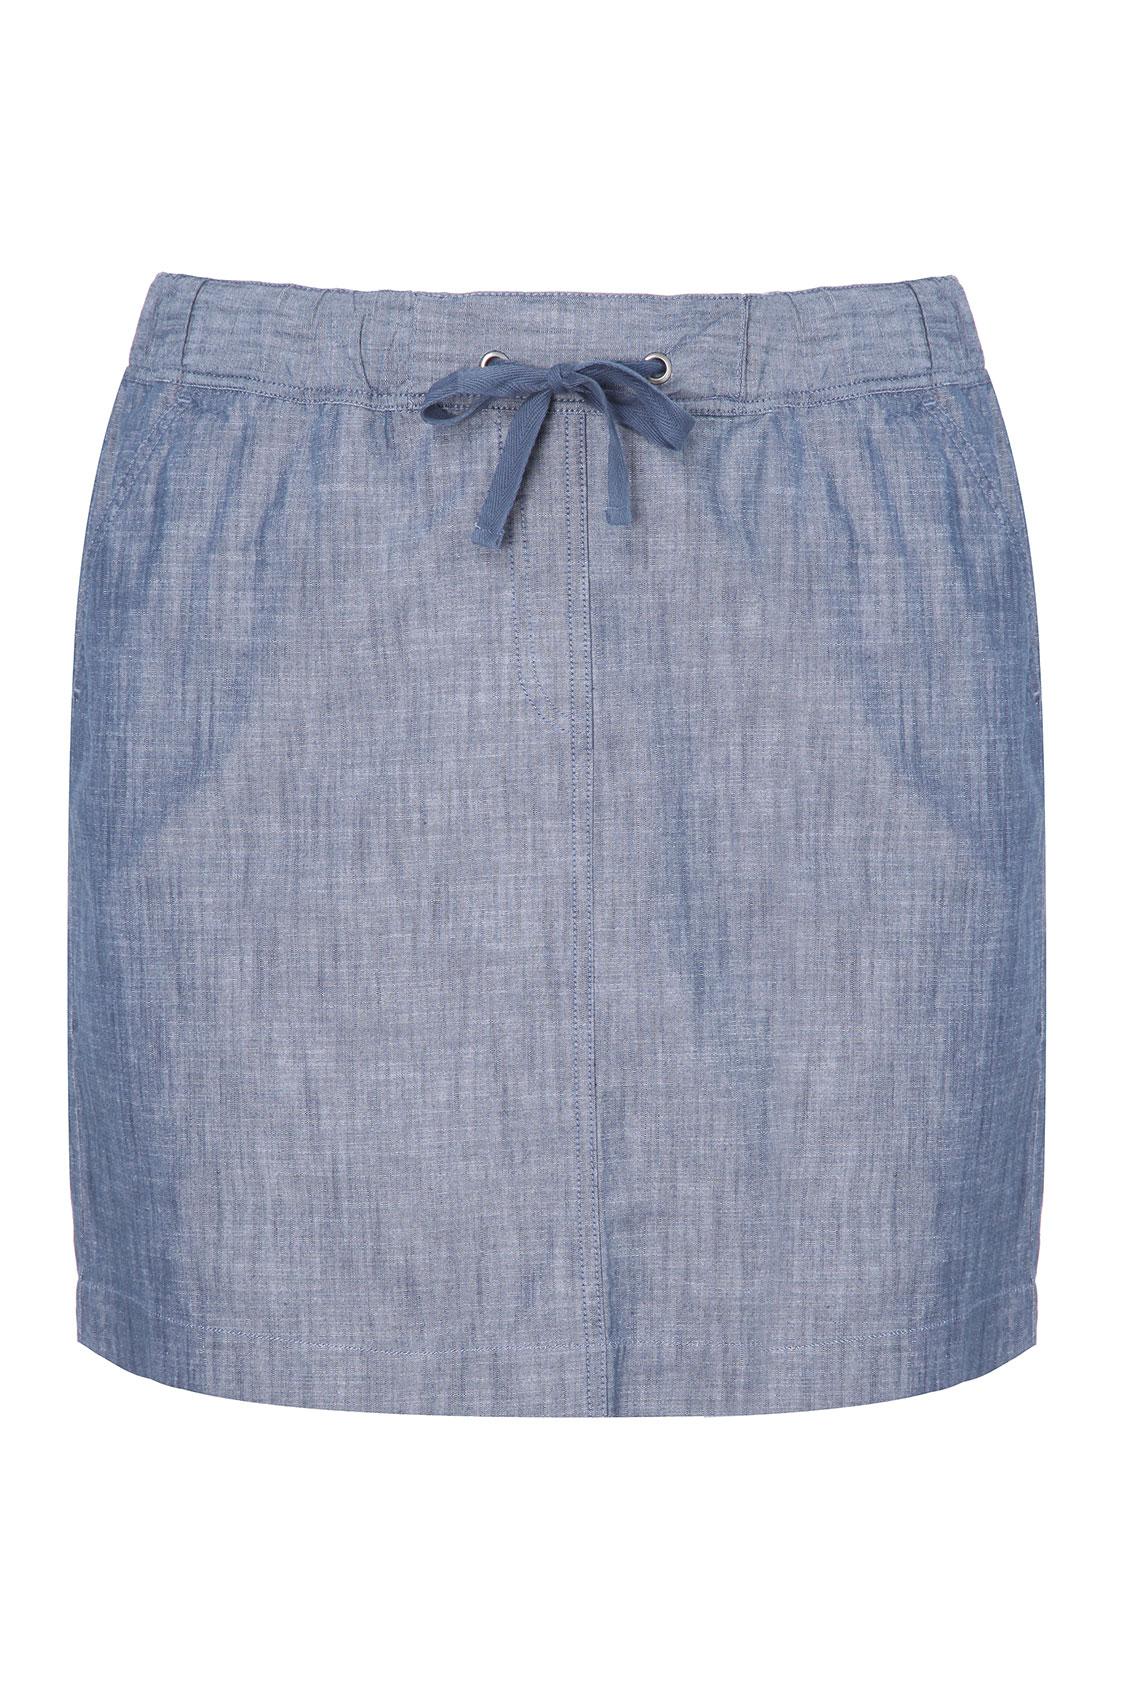 blue chambray lightweight denim skirt plus size 16 18 20